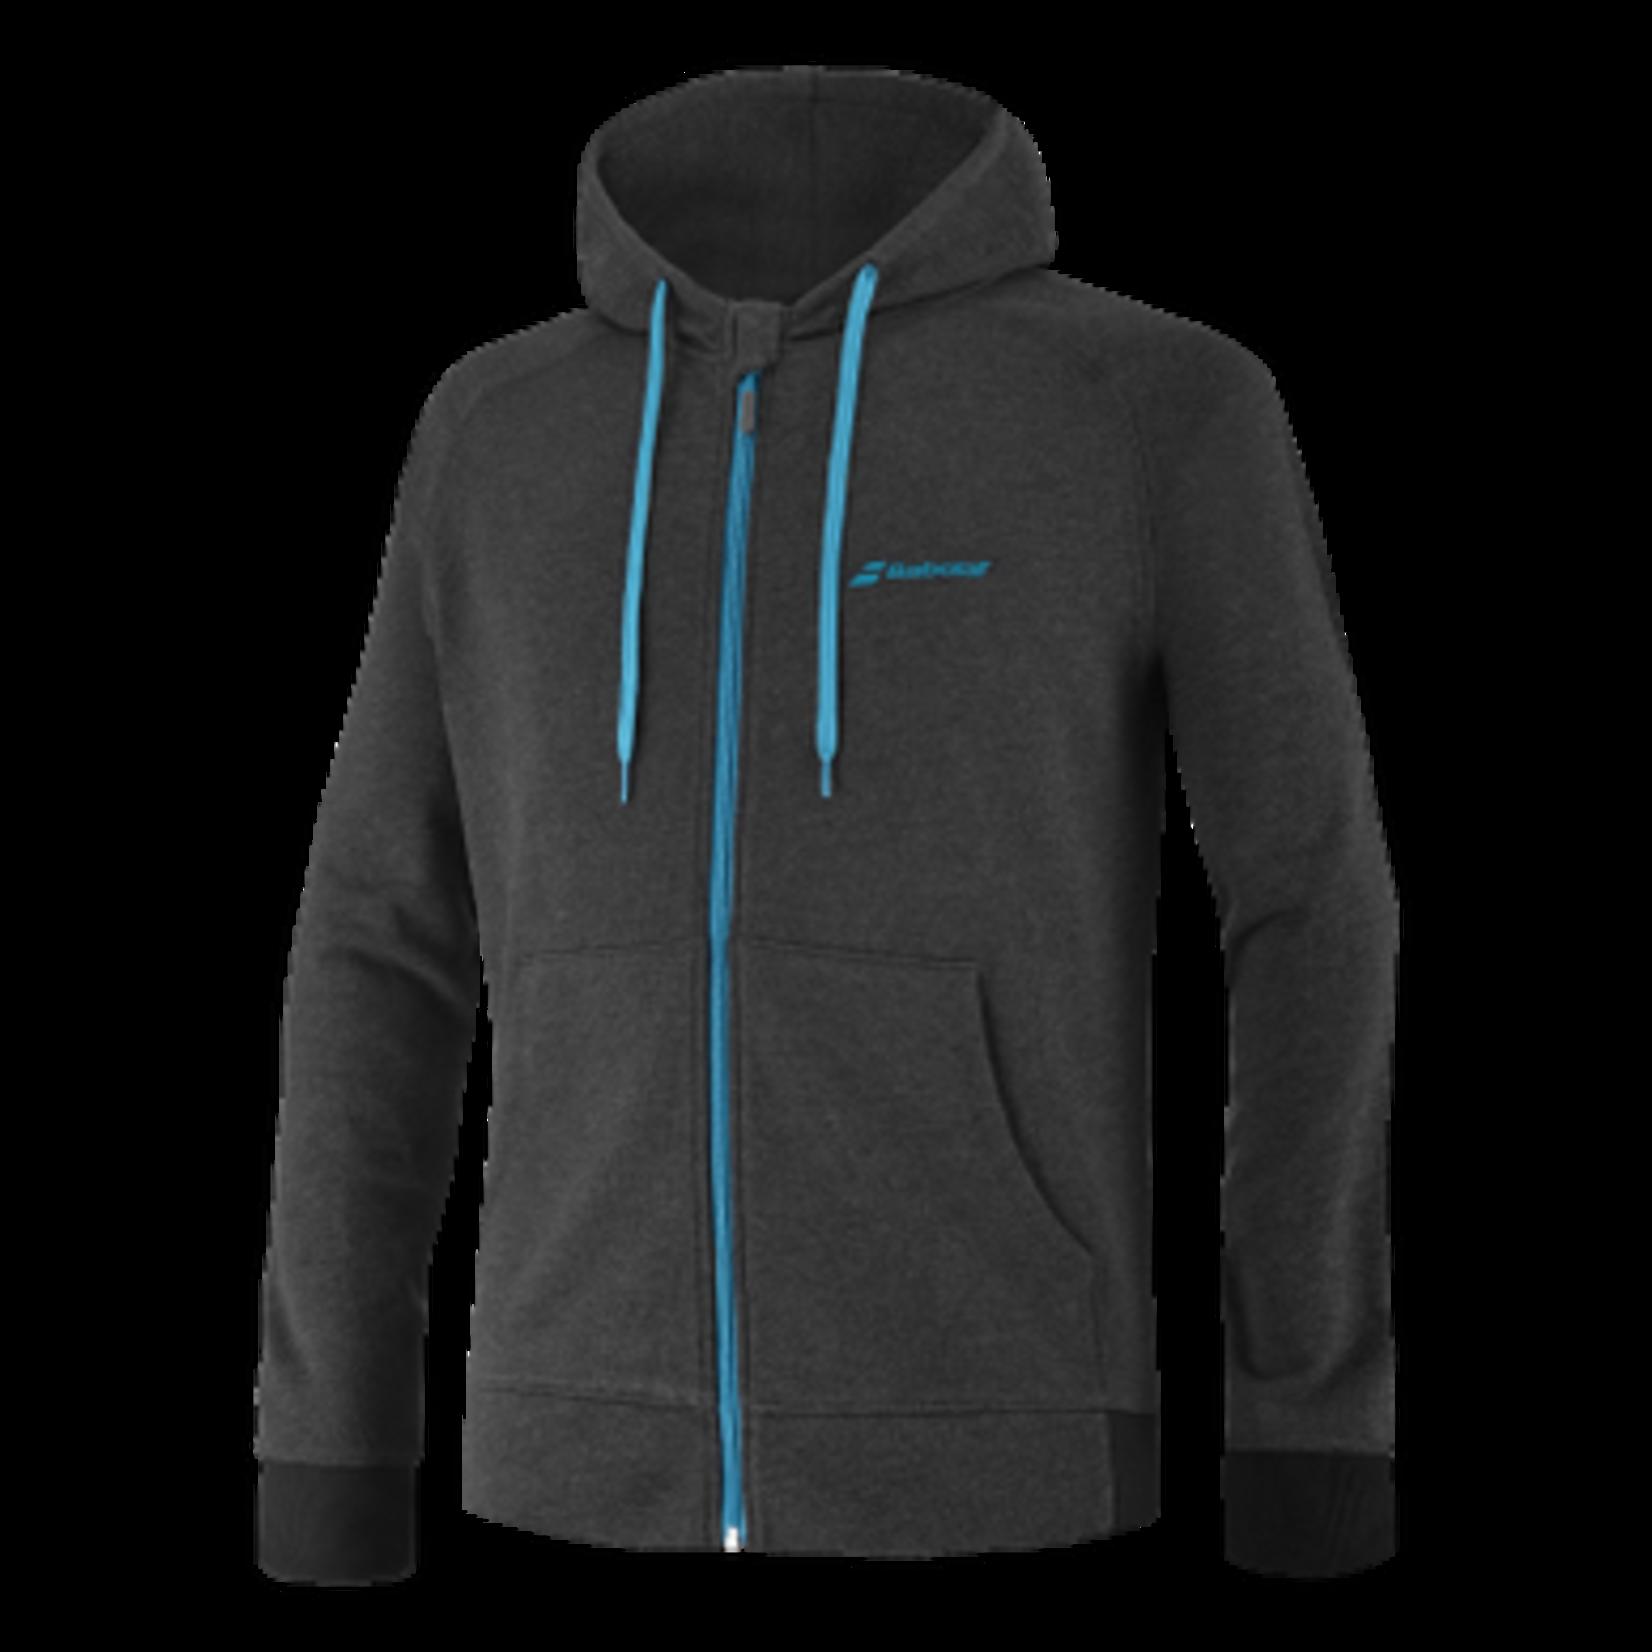 Babolat Heren - Exercise Hood Jacket Trainingsvest